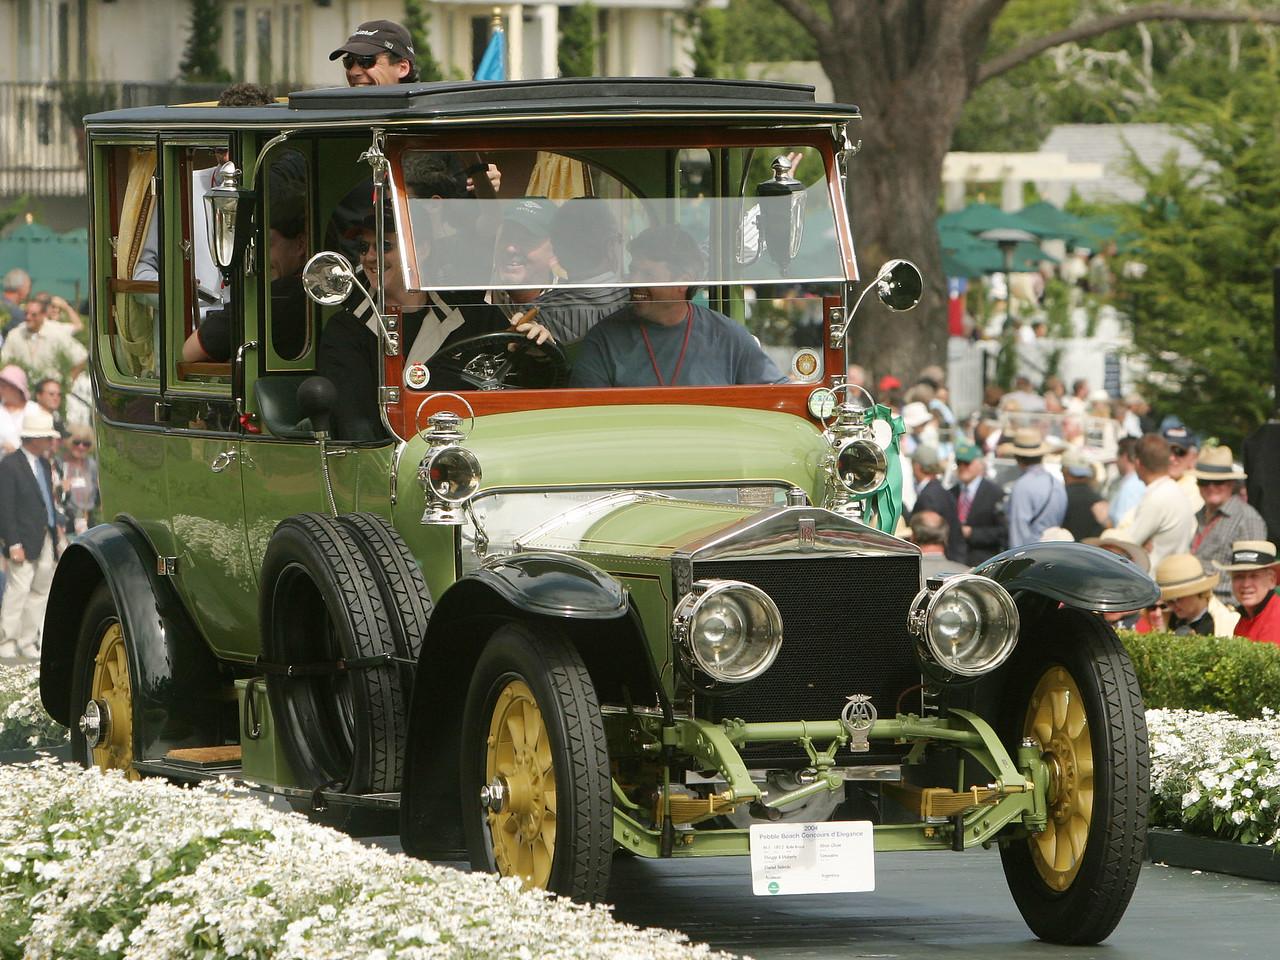 1912 Rolls-Royce Silver Ghost Thrupp & Maberly Limousine.  Co-Chairman's Trophy.  Daniel Sielecki.